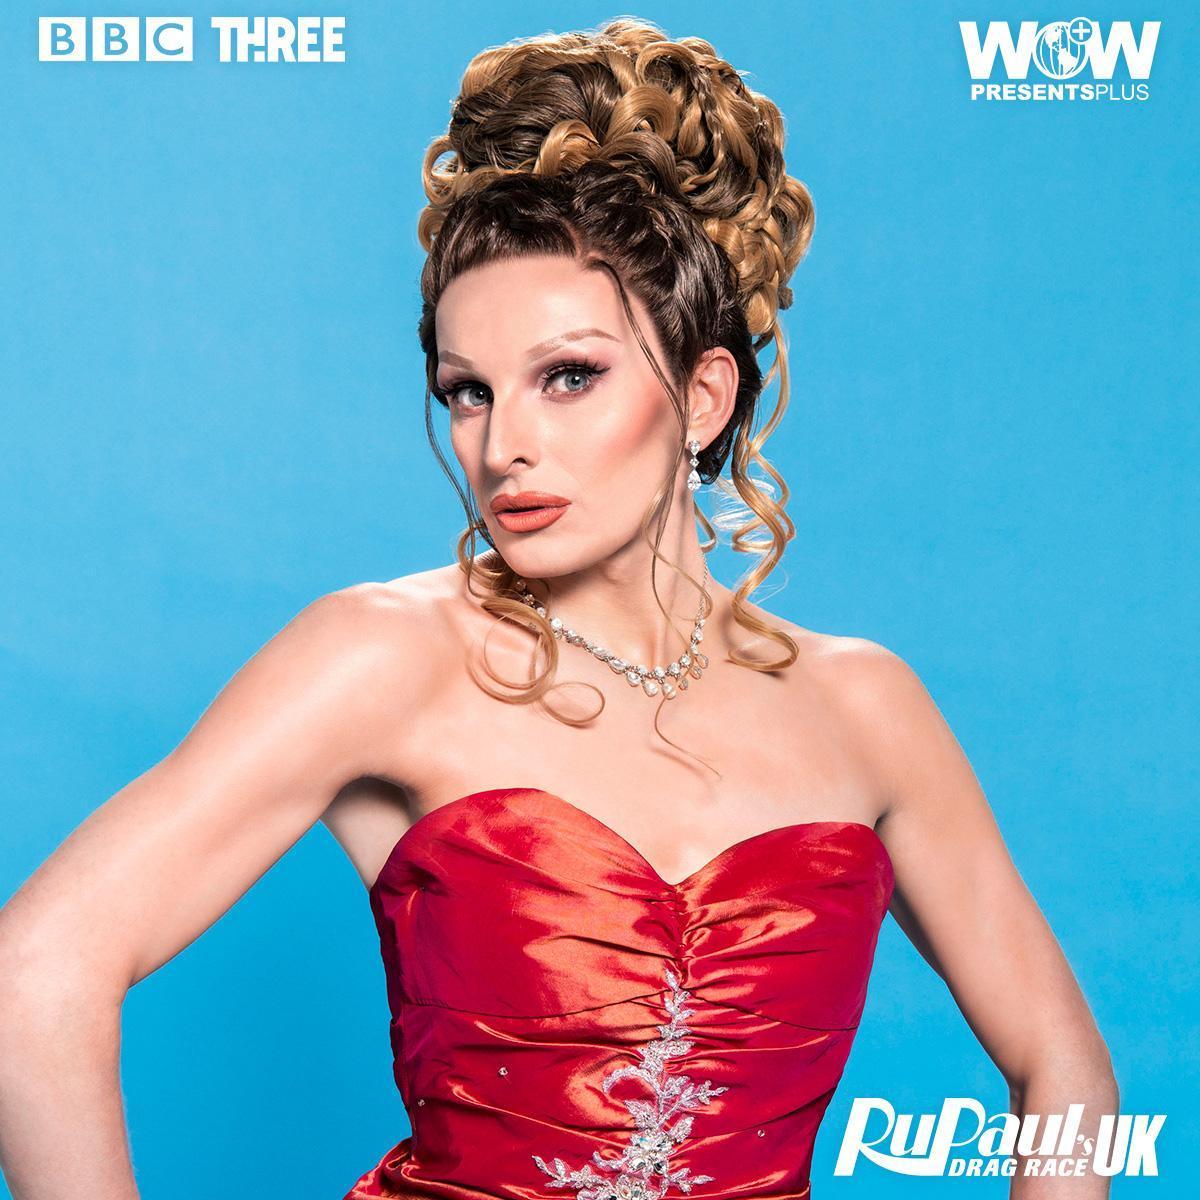 Meet the Queens of RuPaul's Drag Race UK Season 3! 16